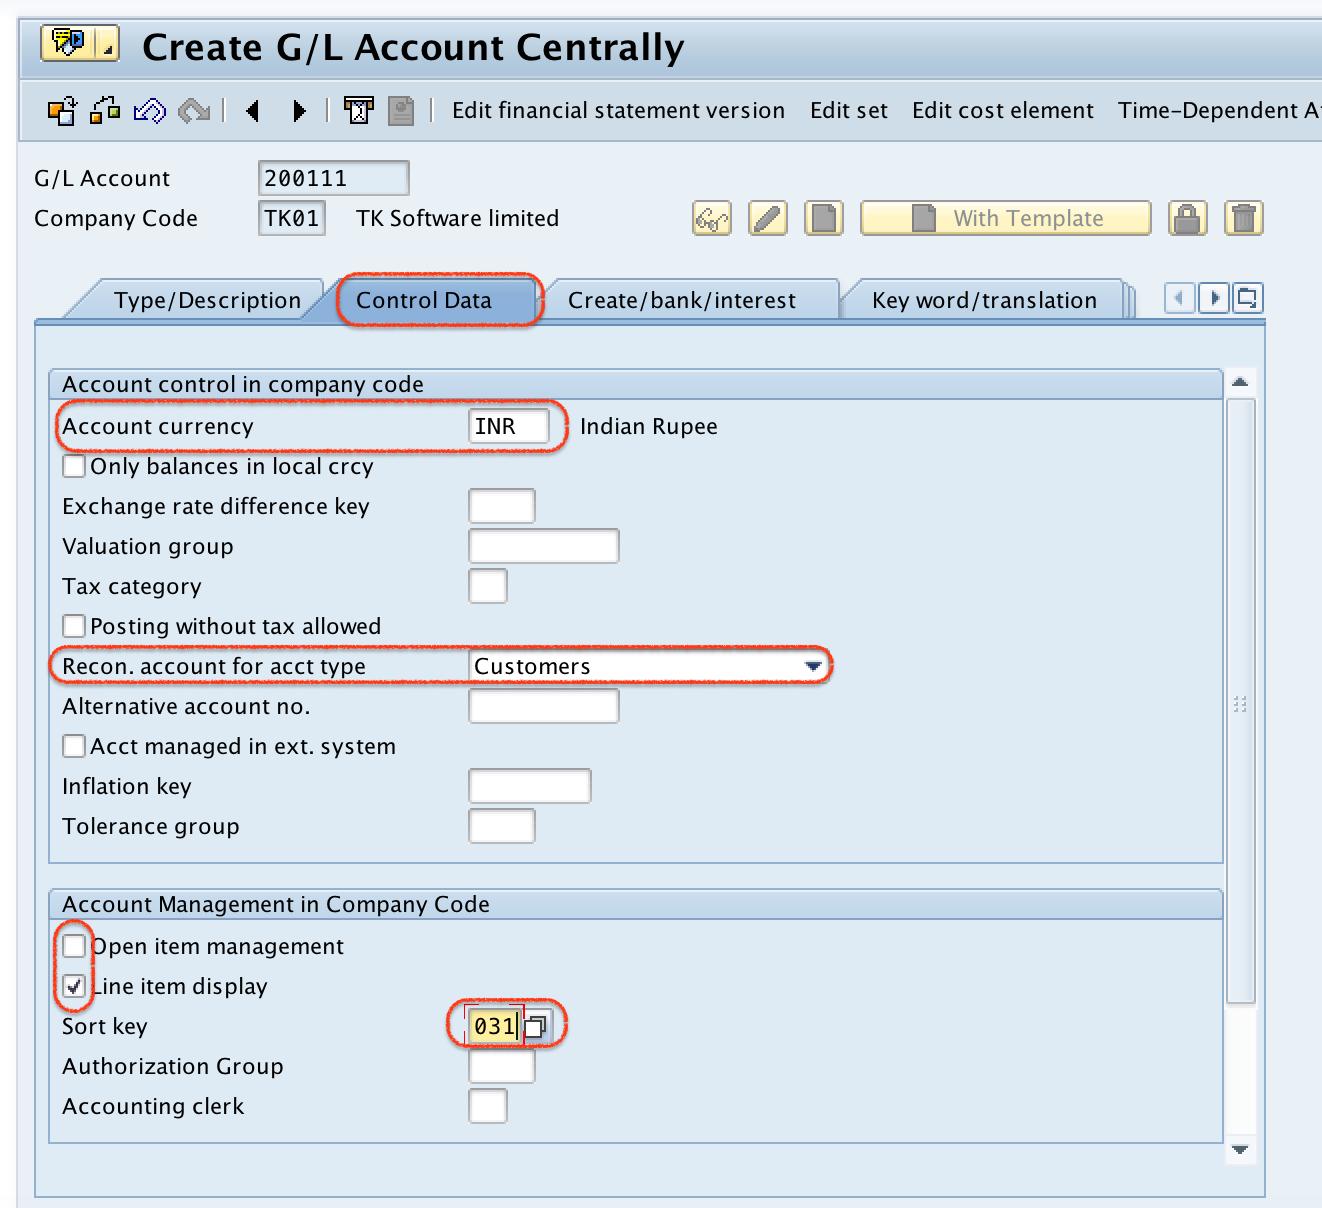 Sundry Debtors SAP control data